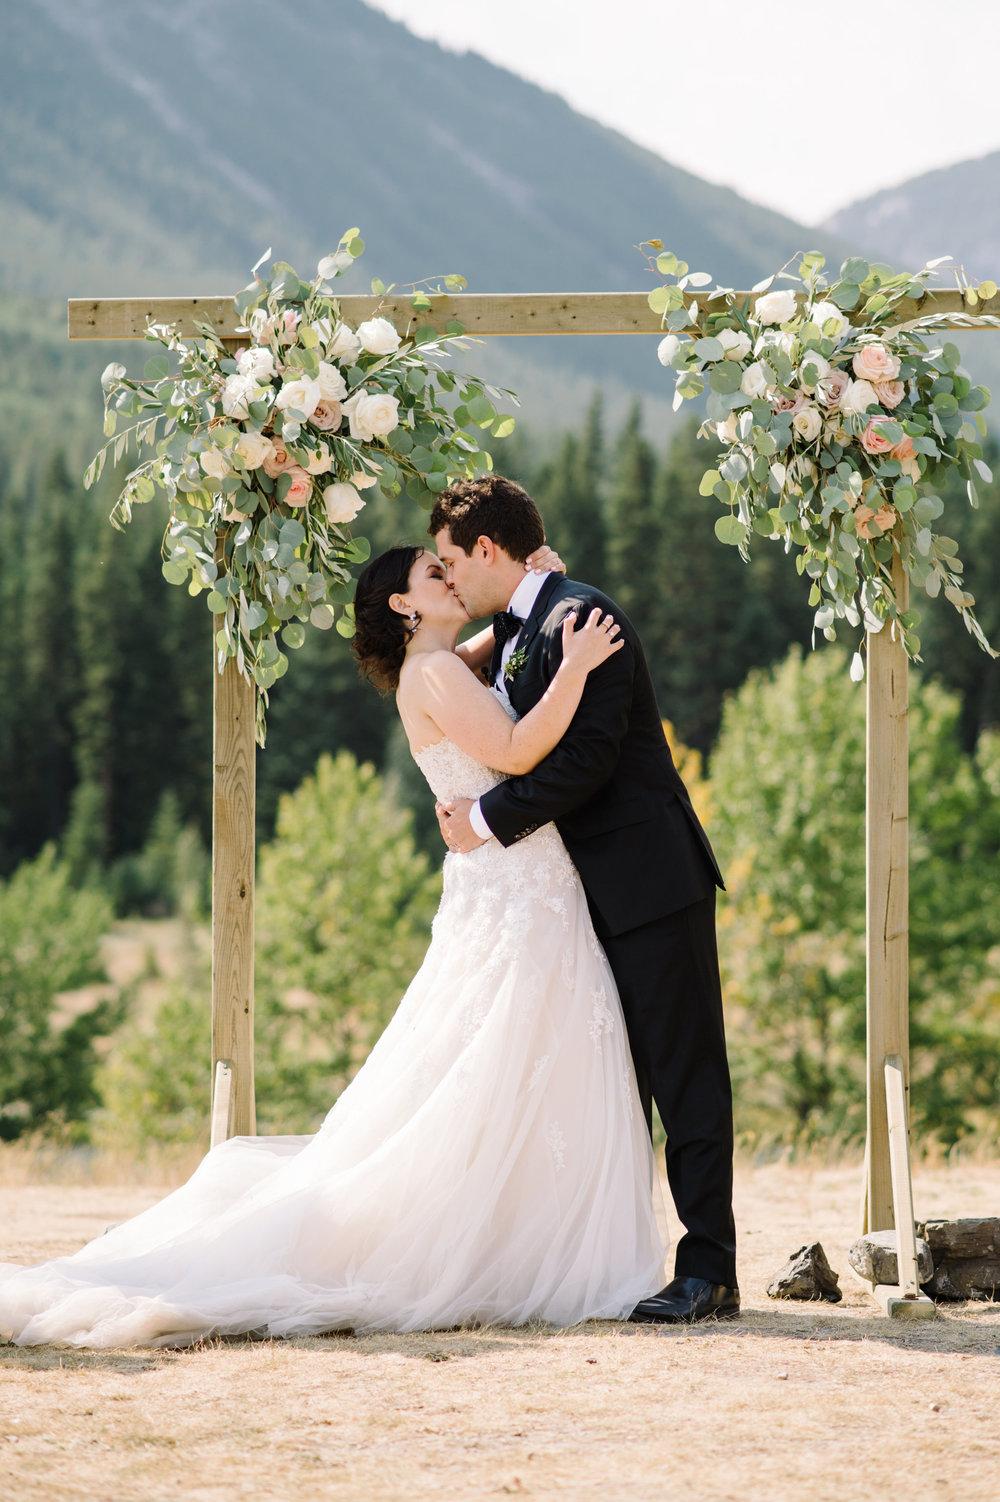 Love in the Mountains(Featured in Confetti Magazine Fall/Winter 2018) - Emily + Adam